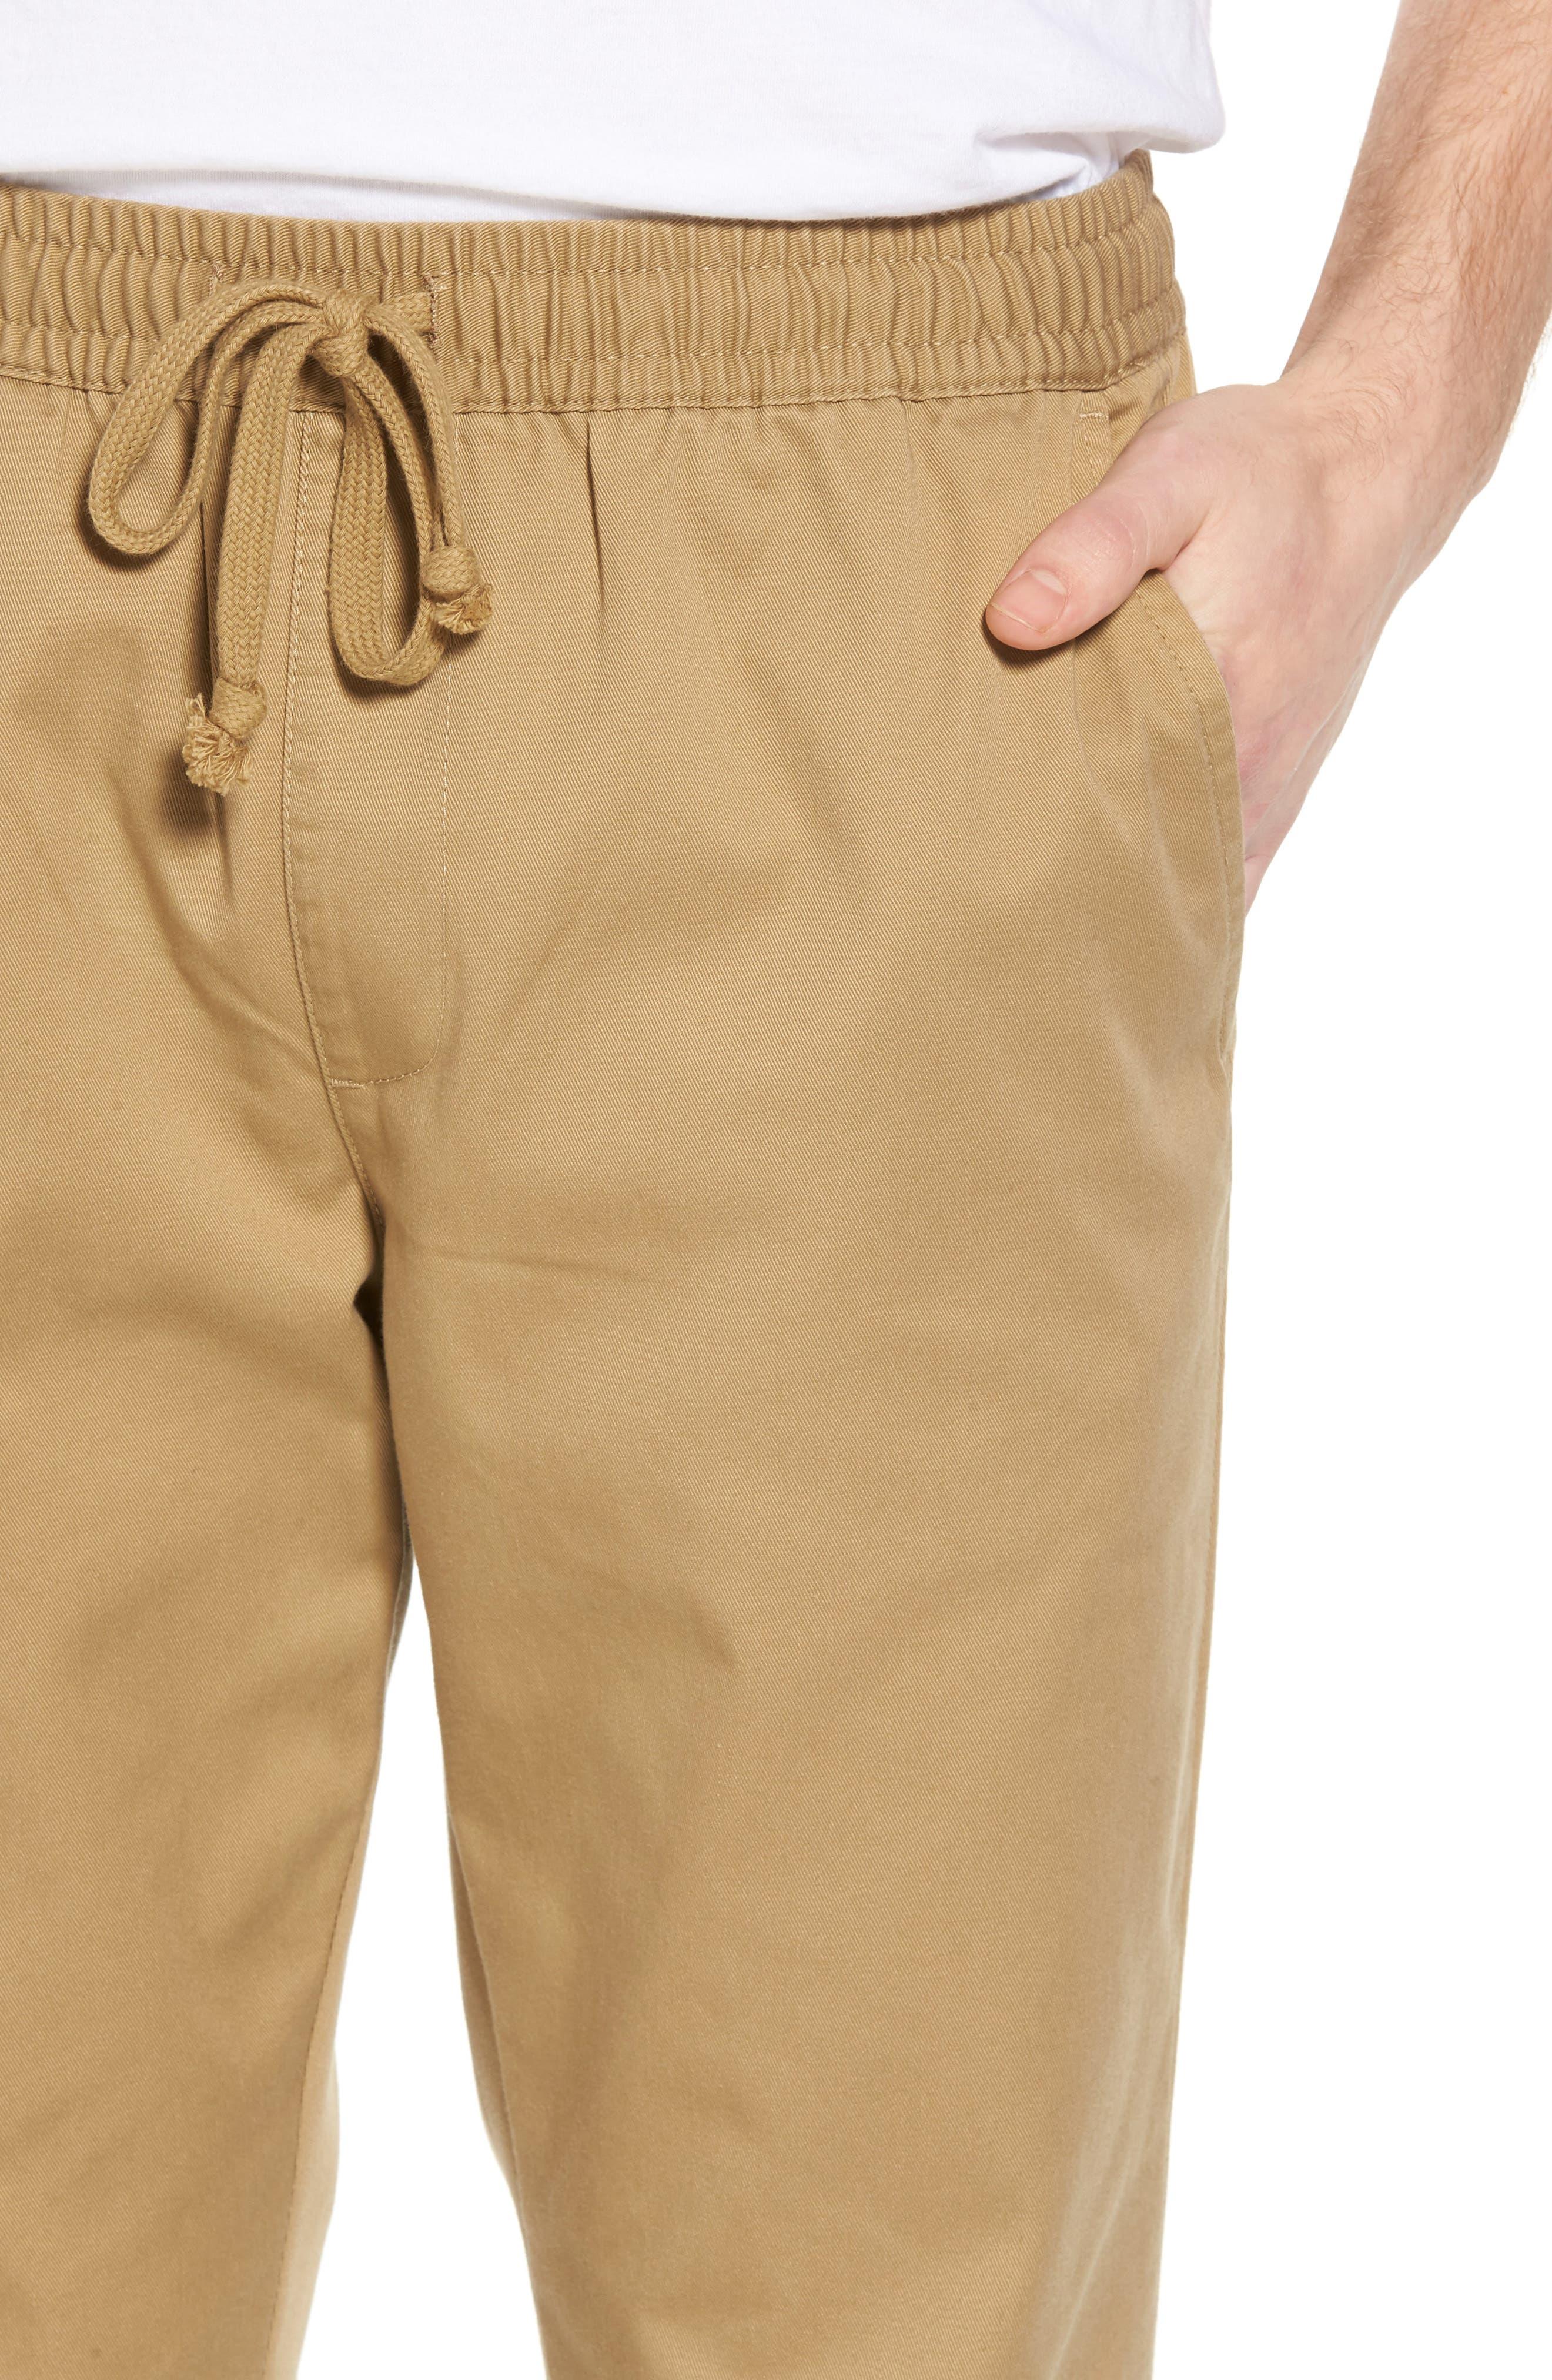 A.T. Dayshift Pants,                             Alternate thumbnail 11, color,